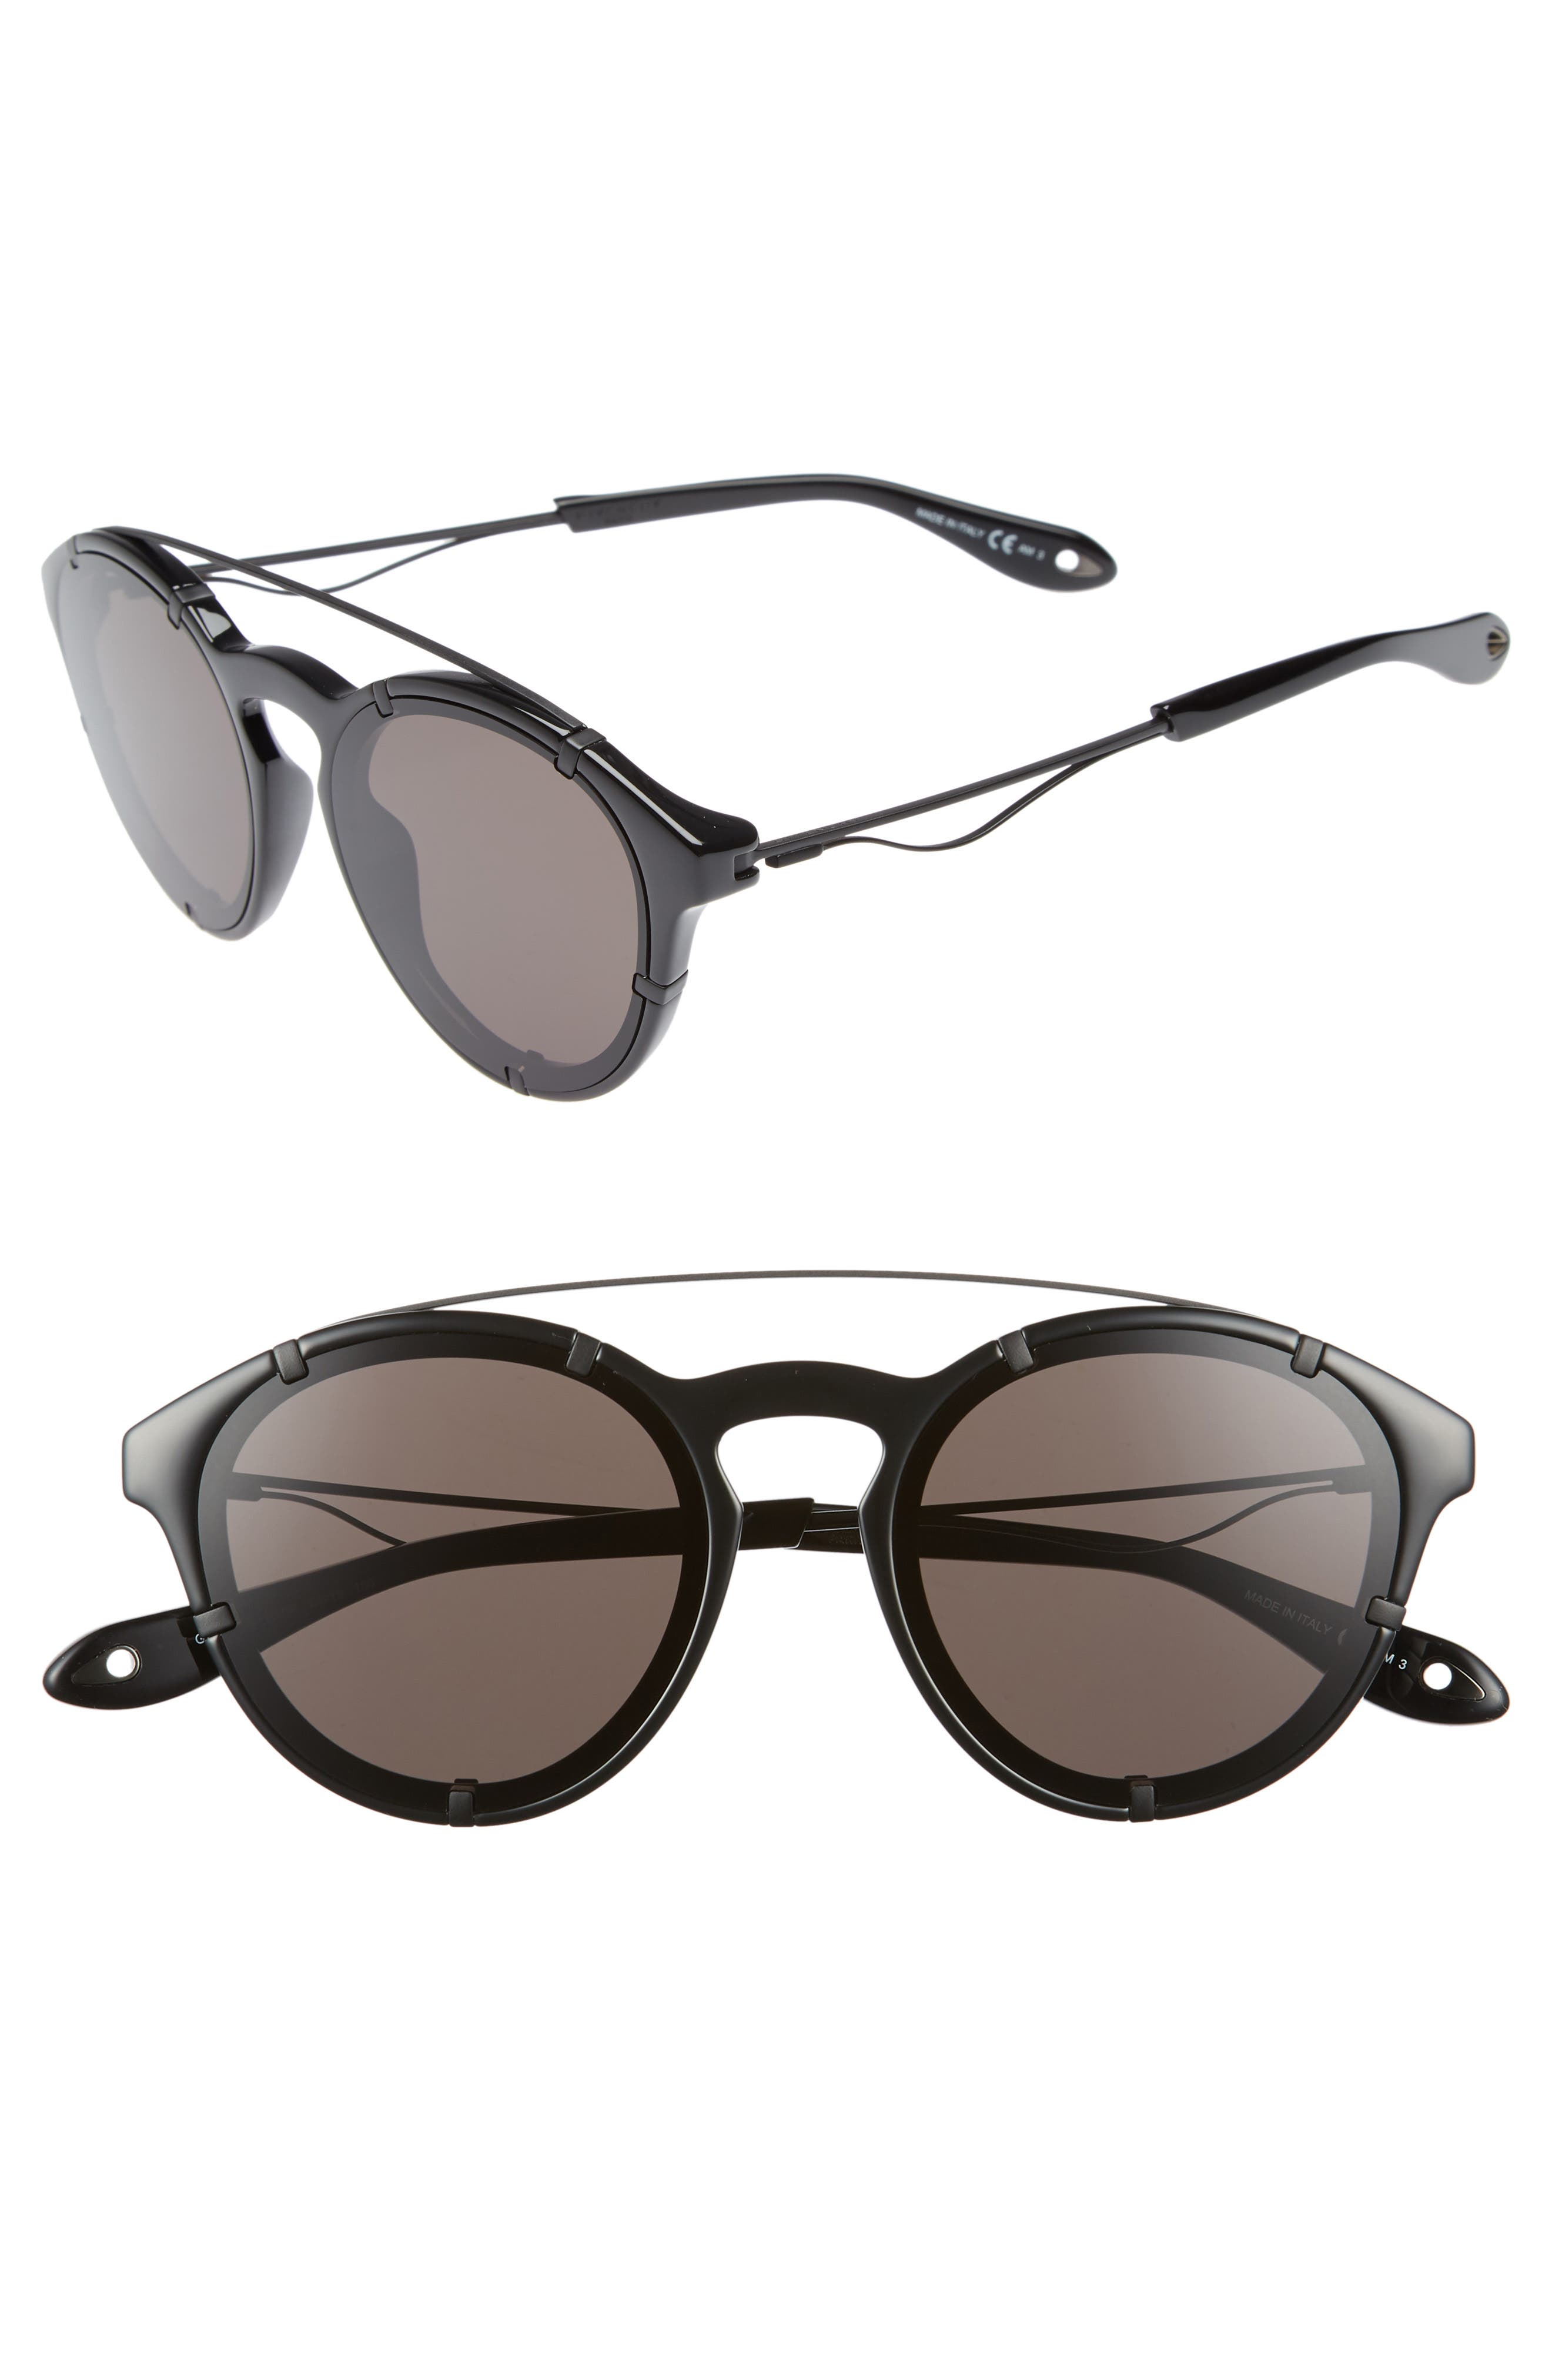 54mm Round Polarized Sunglasses,                             Main thumbnail 1, color,                             Black